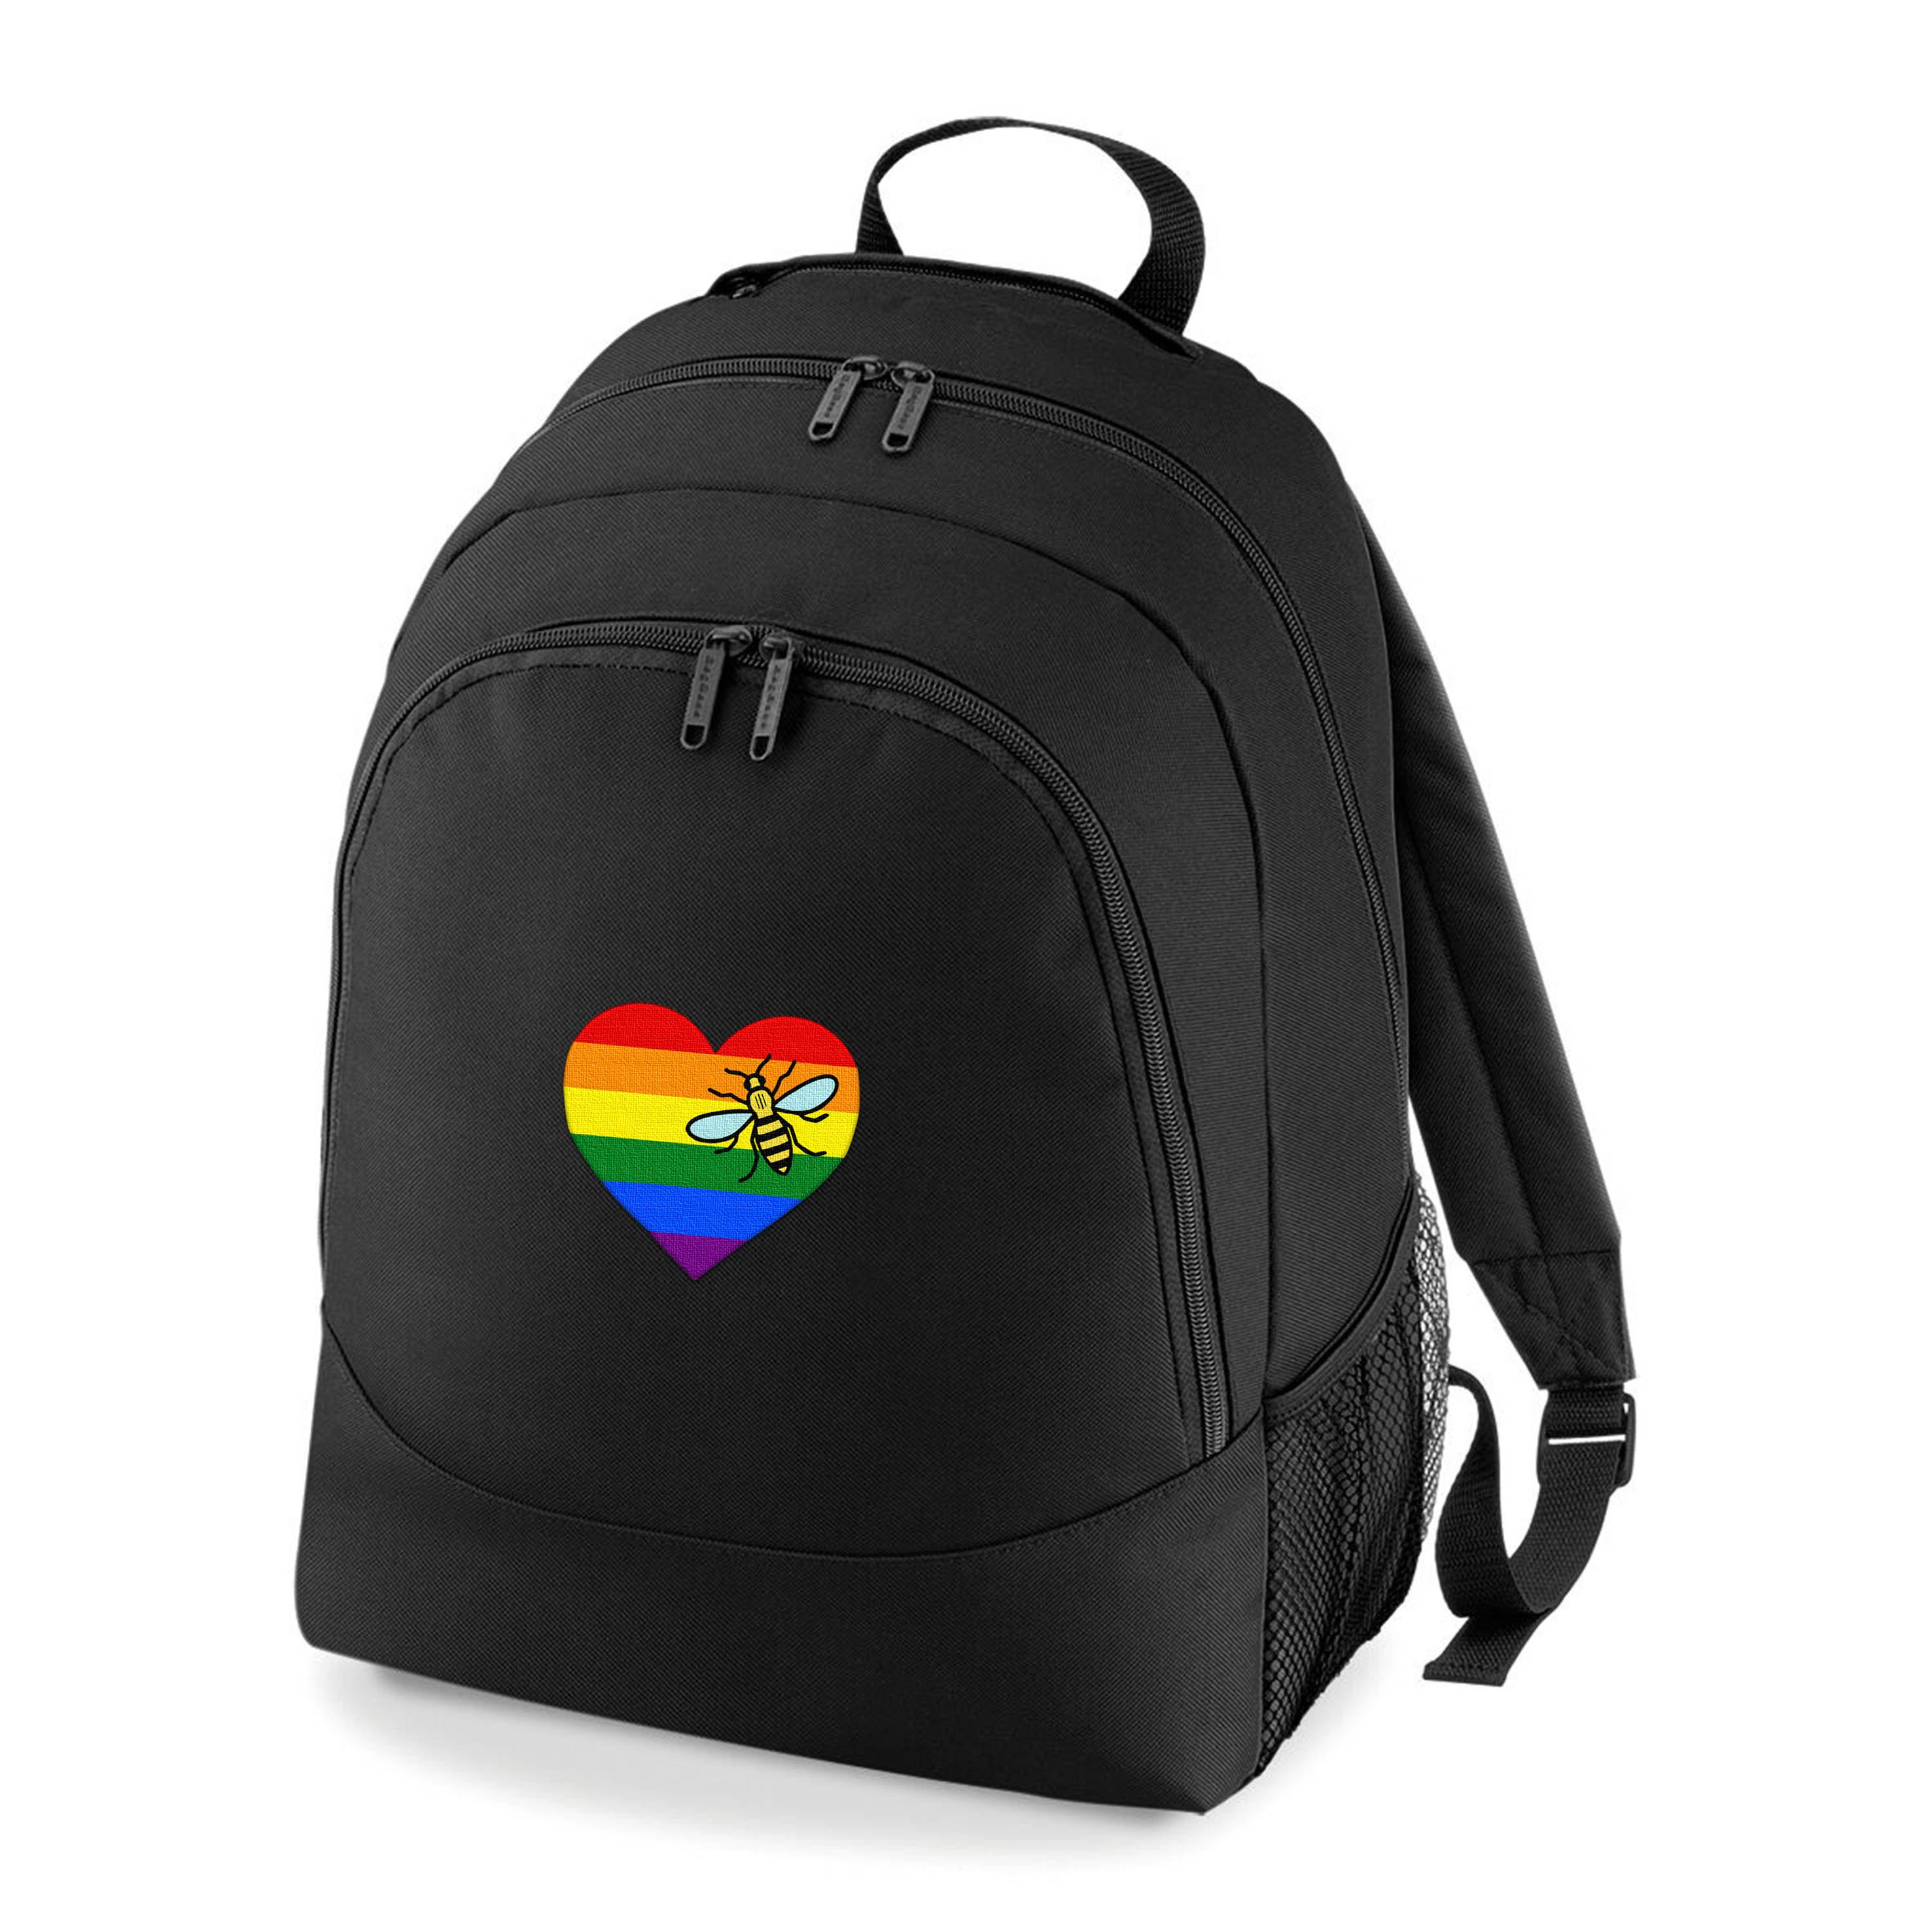 Rainbow Pride Rucksack Bag